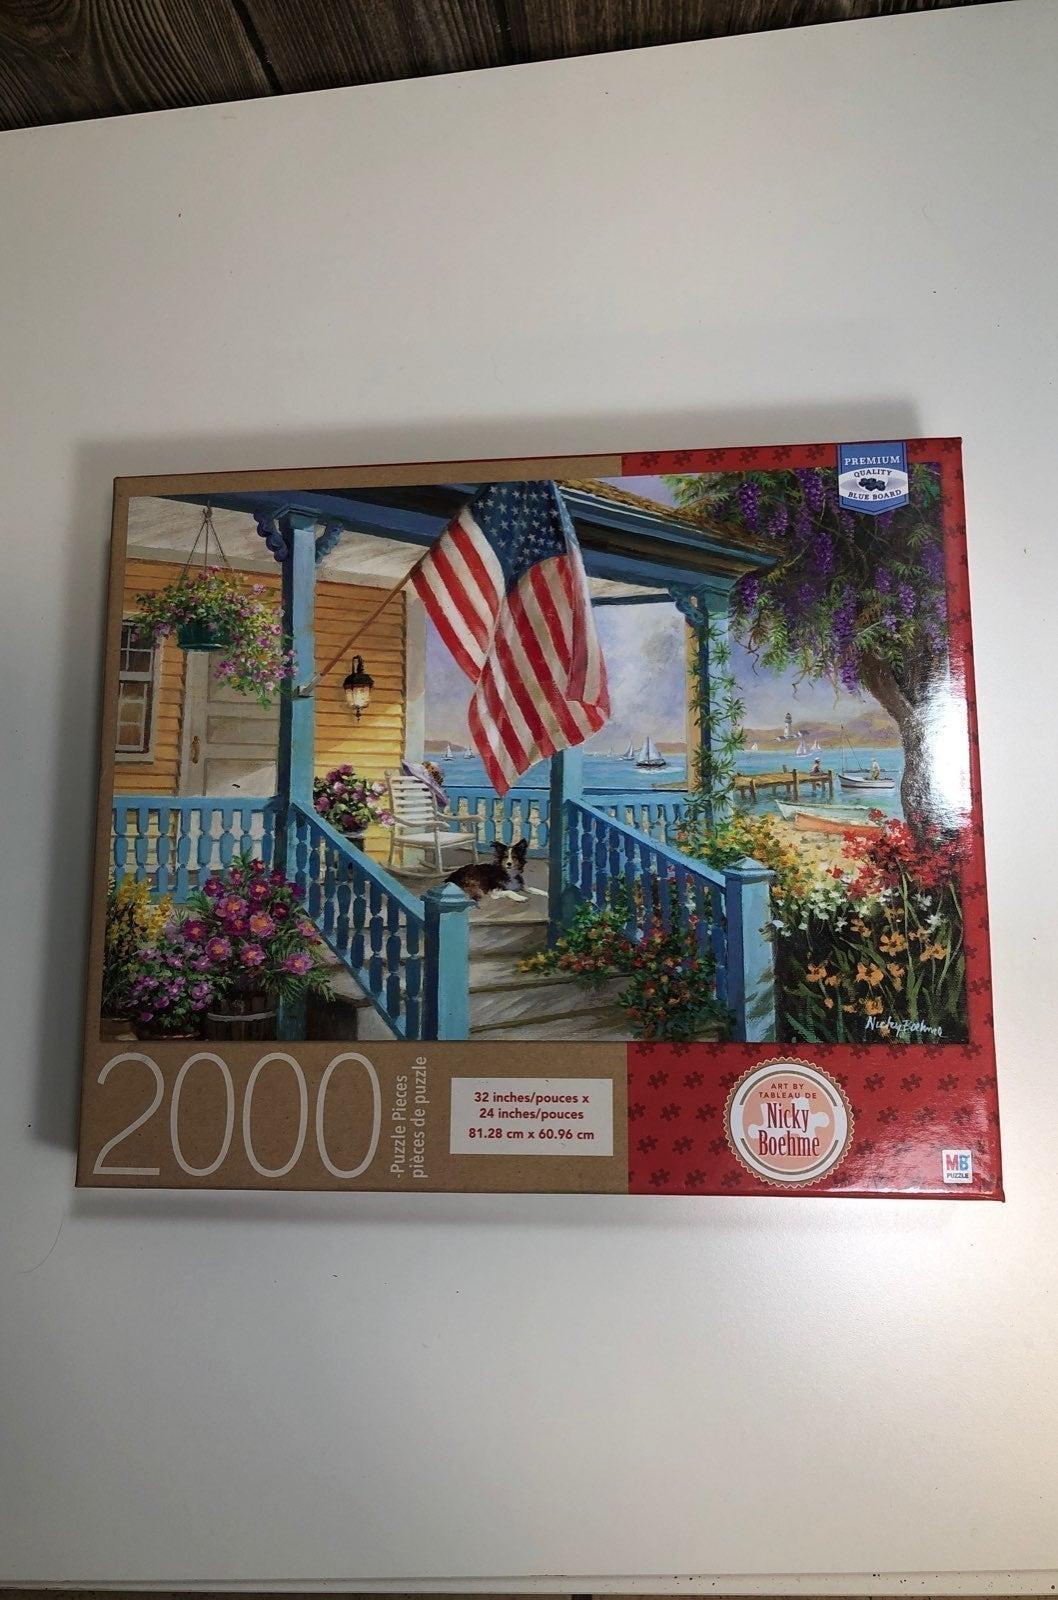 2000 piece puzzle - (Nicky Boehme)